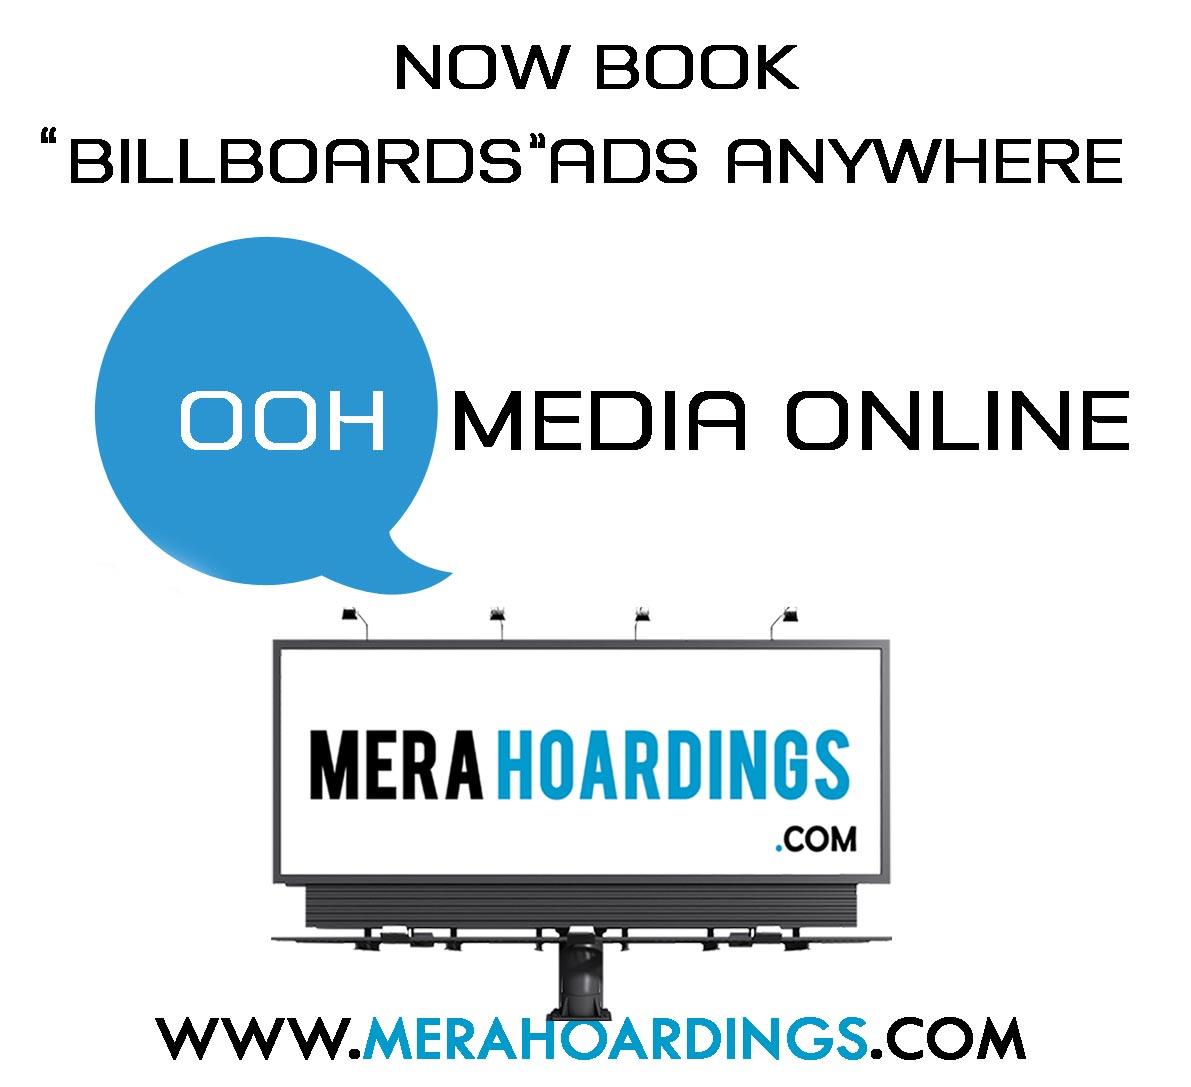 hoarding advertising online booking, billboard Advertising Online Booking, Outdoor Advertising online booking, Out-of-home (OOH) advertising online, buy Hoardings online, ad space booking online, billboard online, billboard advertising online booking, Hoardings online, out-of-home media (OOH) Online